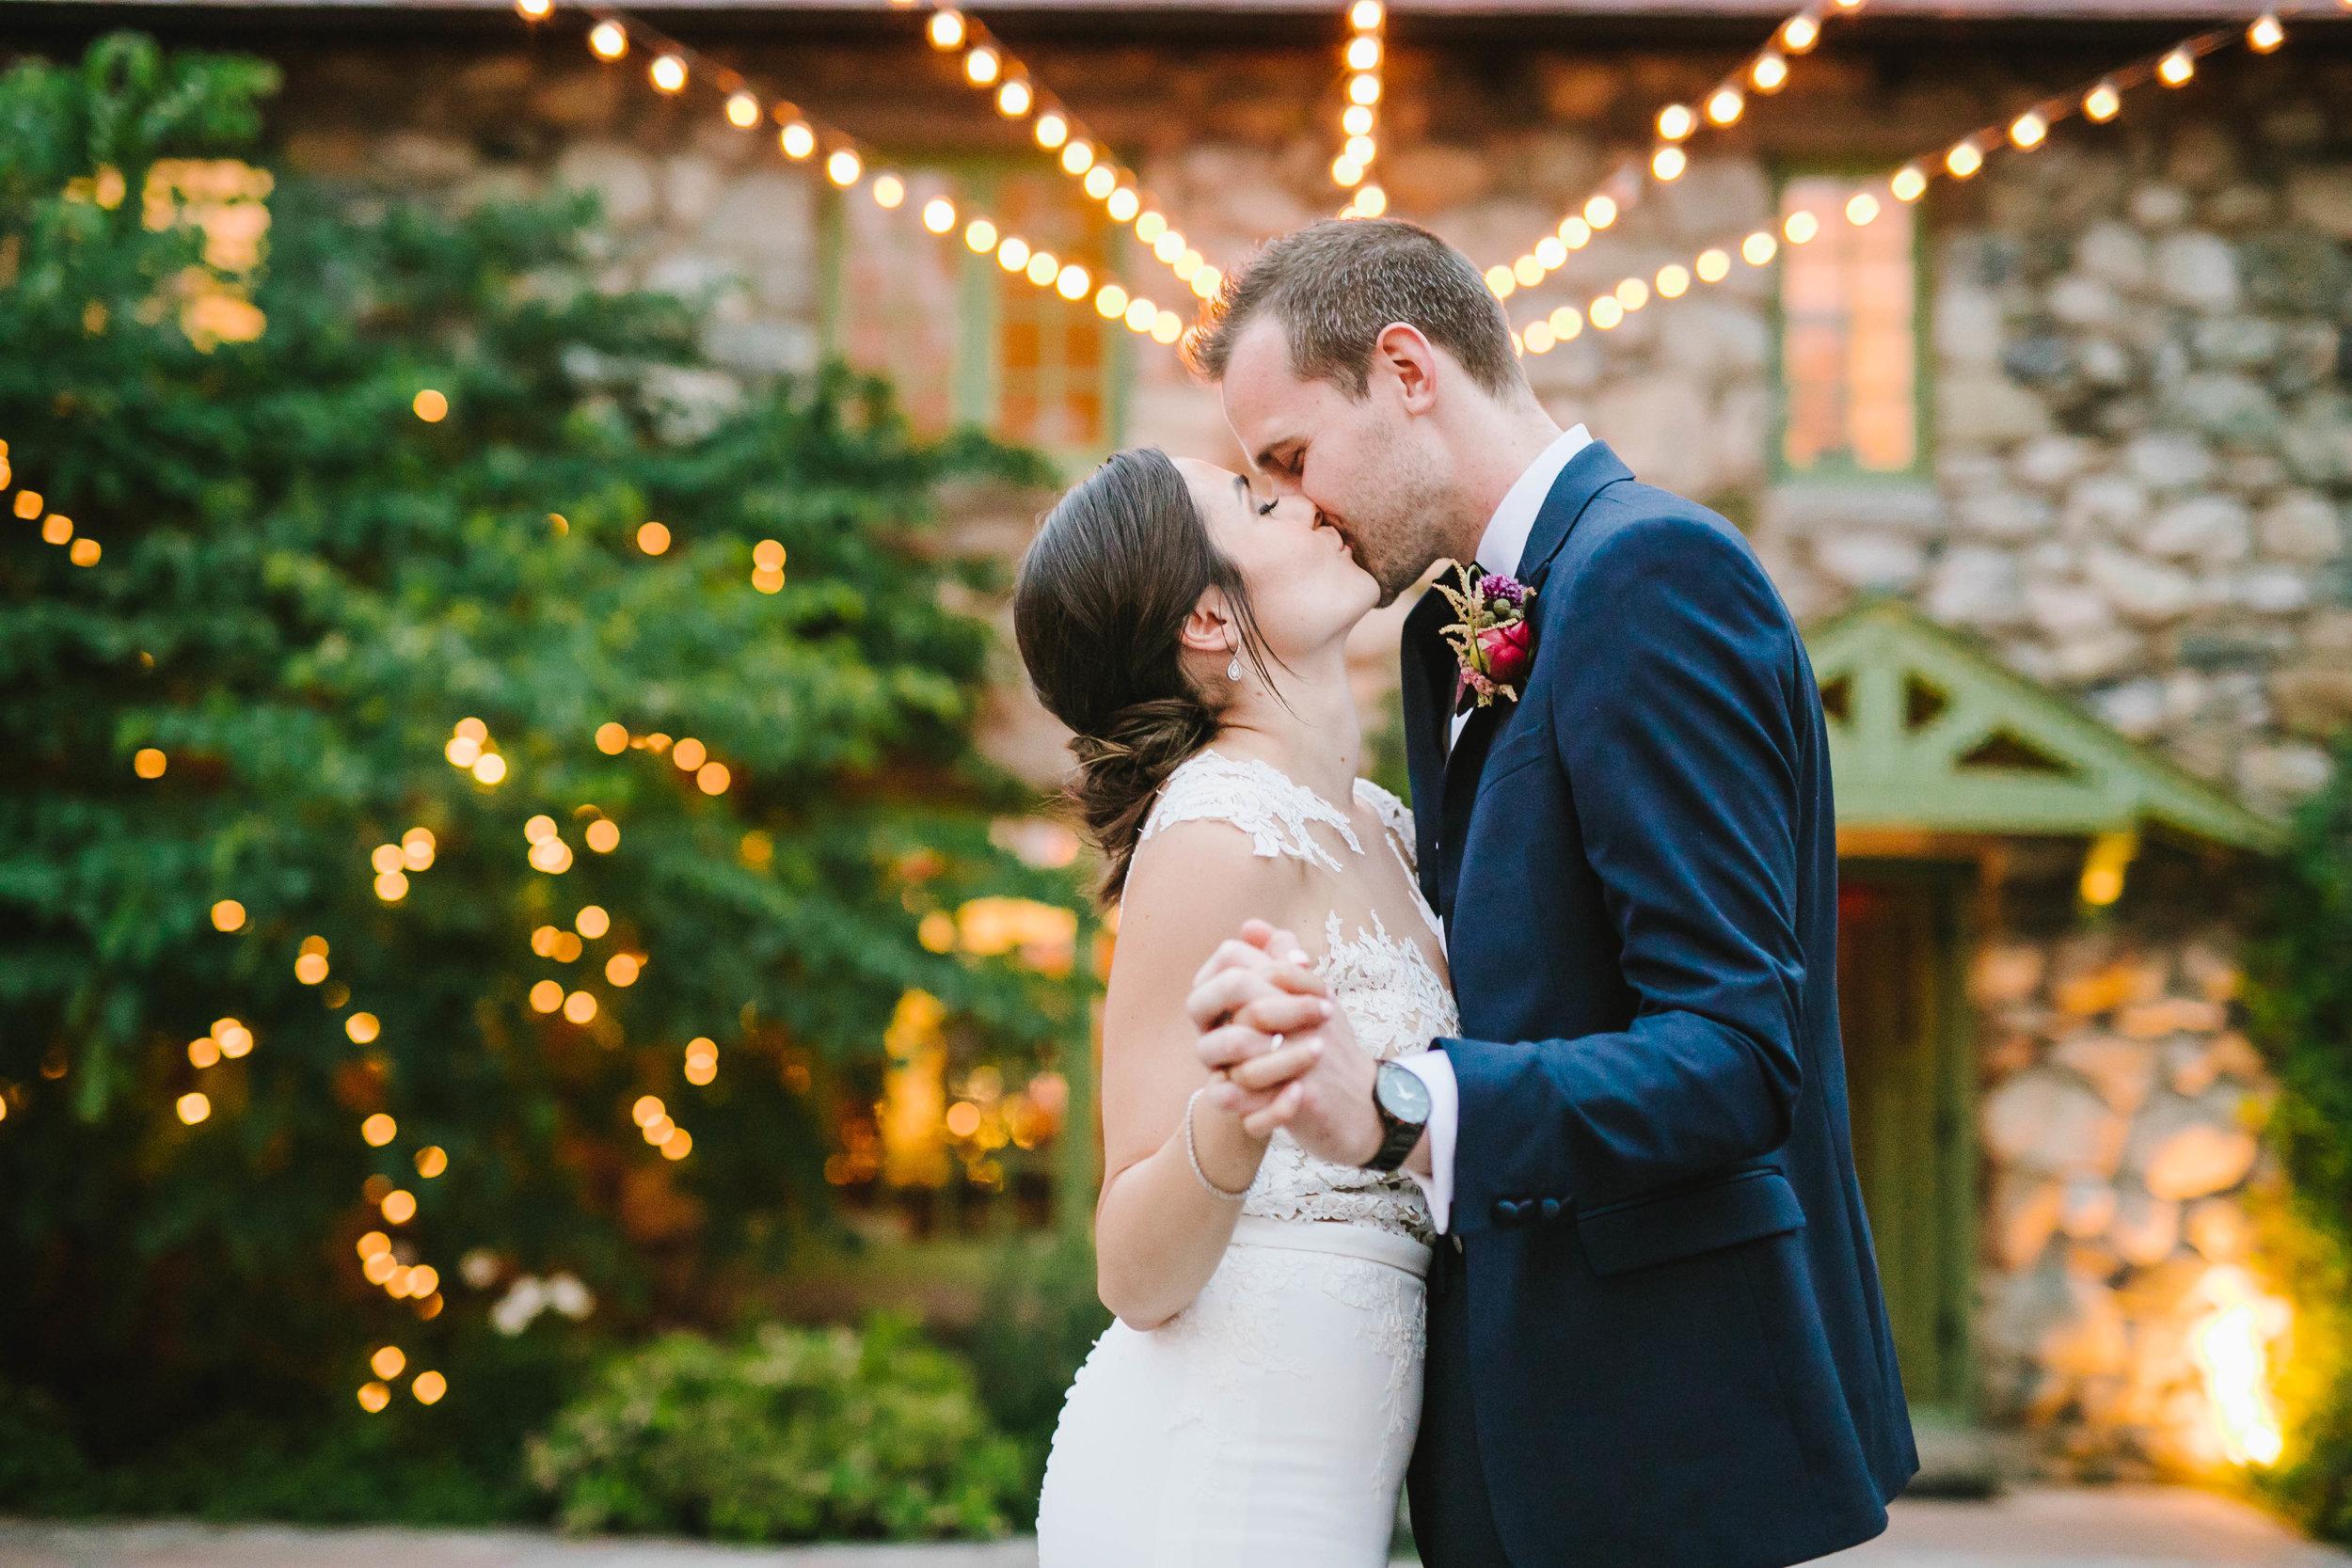 Willowdale Estate Wedding Boston Topsfield MA Italian Garden mansion house wedding - Emily Tebbetts photography-37.jpg